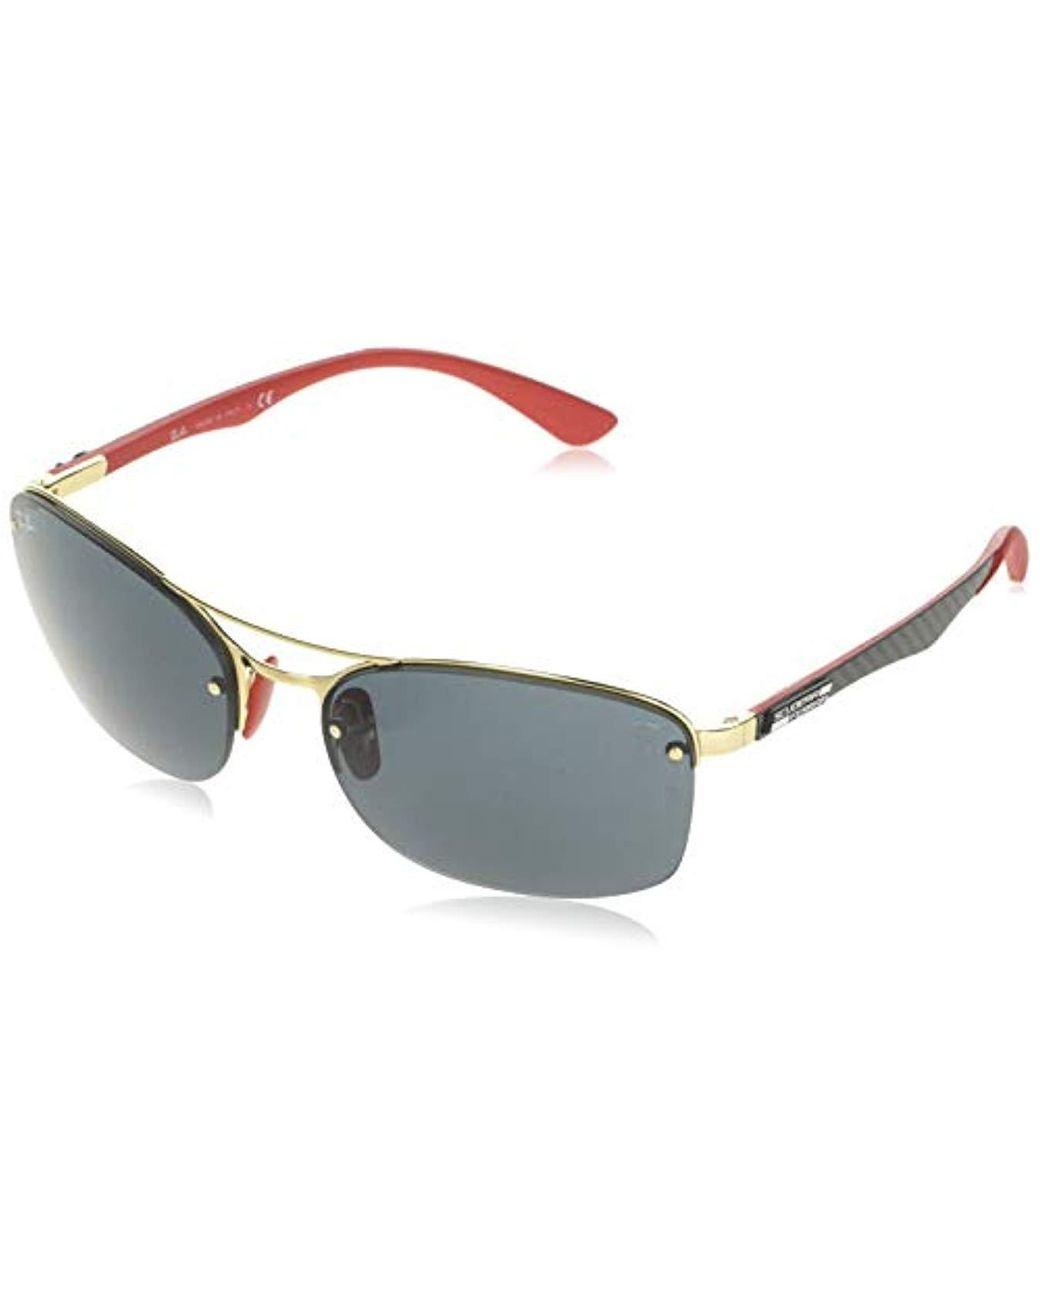 ray ban ferrari sunglasses amazon